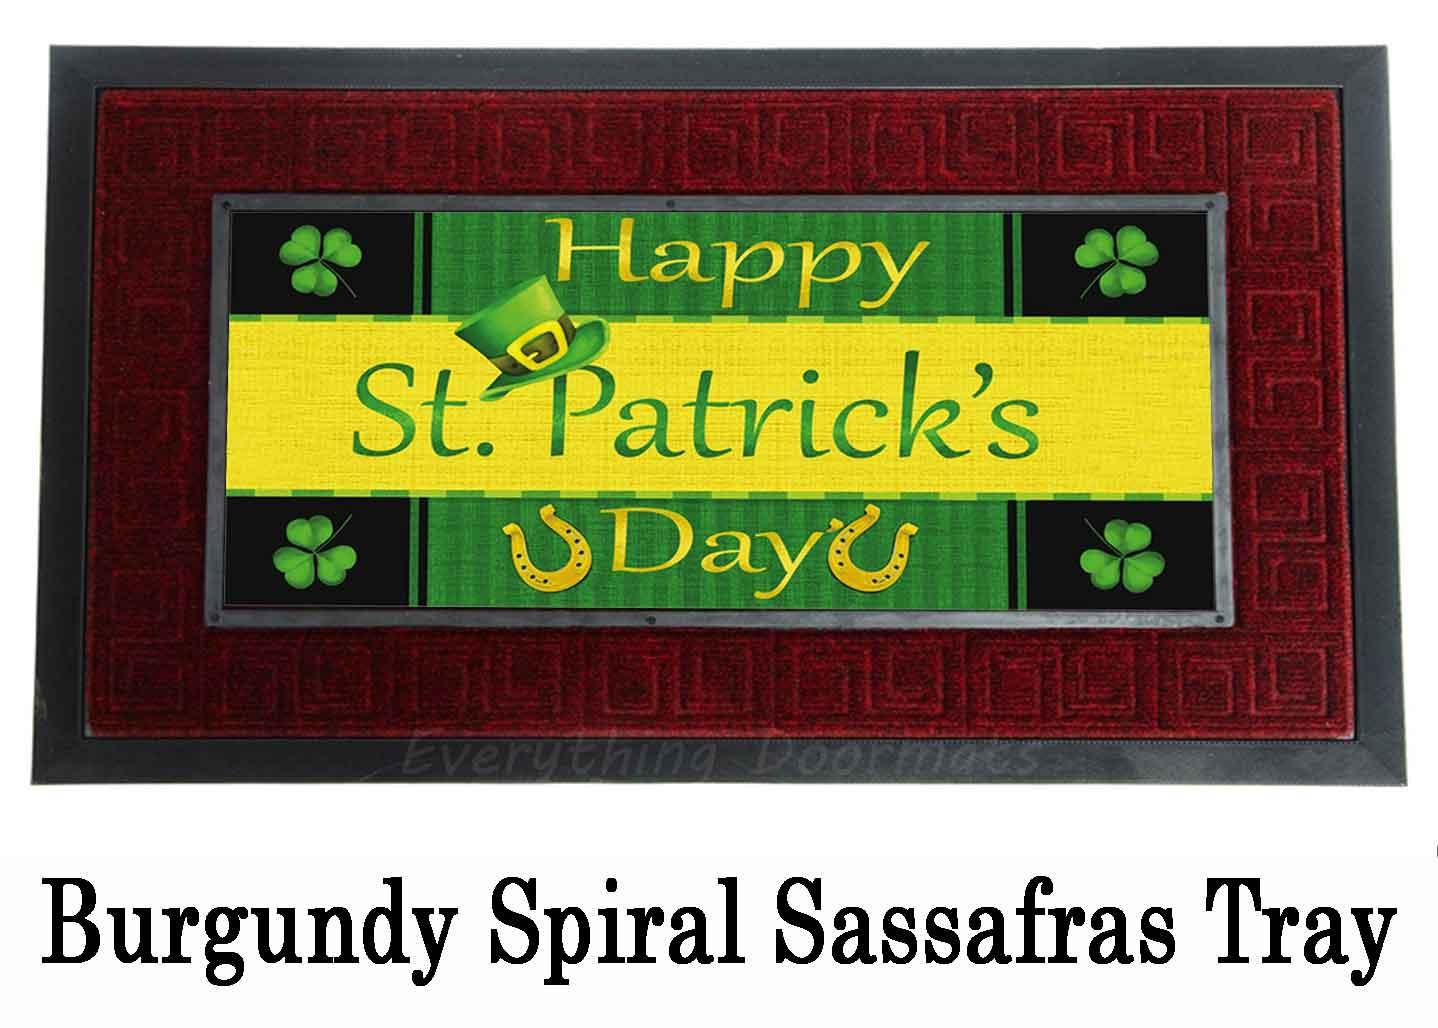 Sassafras Saint Patrick 226 S Day Switch Mat 10 X 22 Insert